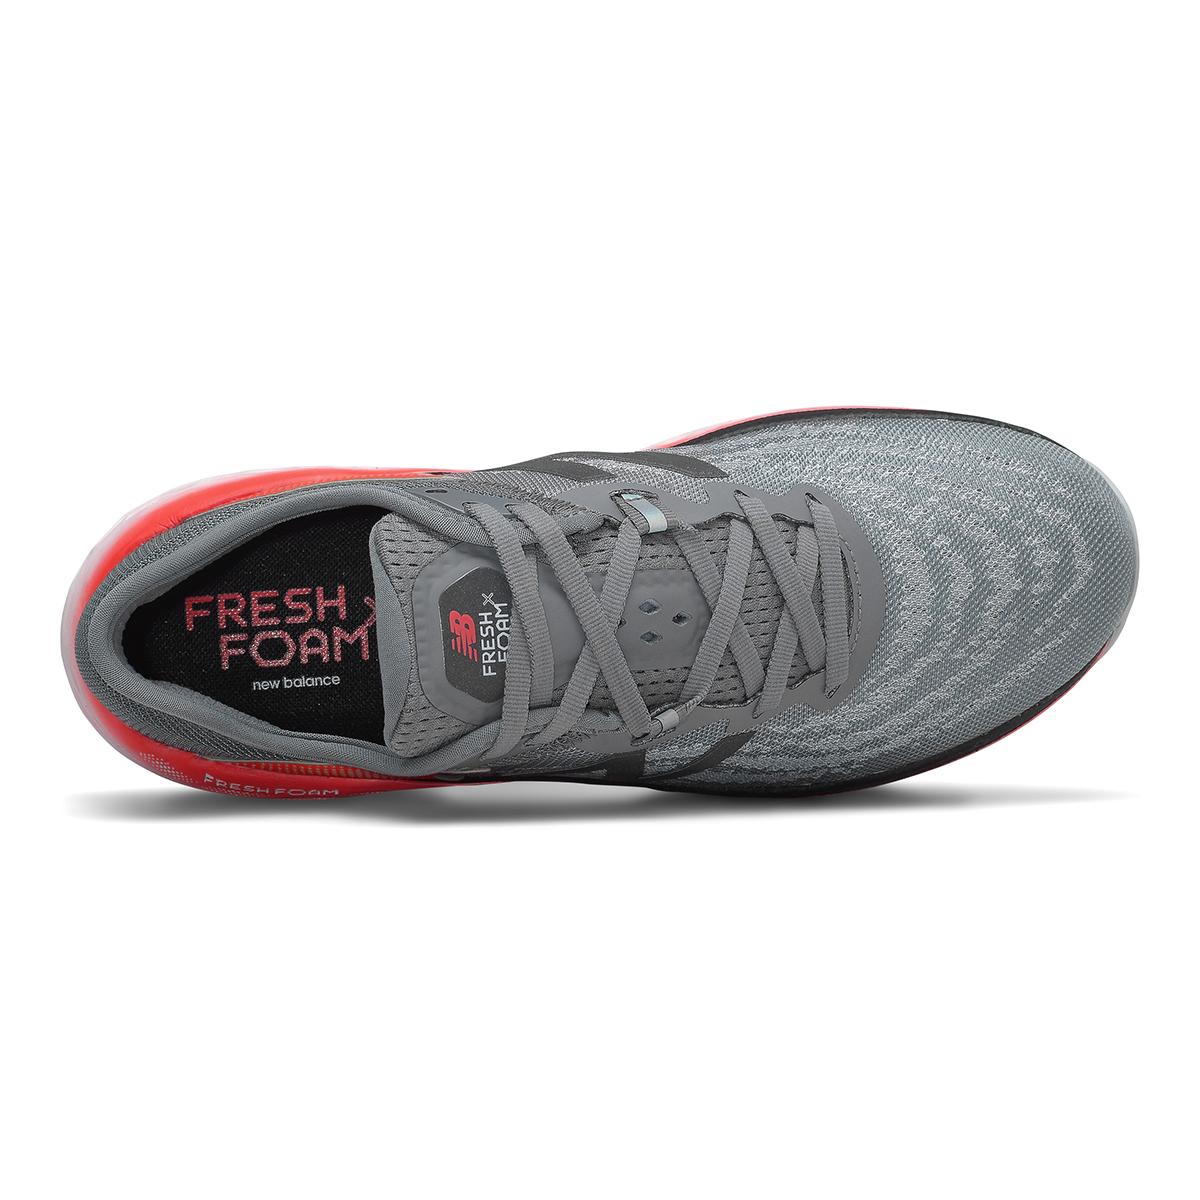 Men's New Balance Fresh Foam More V2 Running Shoe - Color: Gunmetal - Size: 7 - Width: Wide, Gunmetal, large, image 3